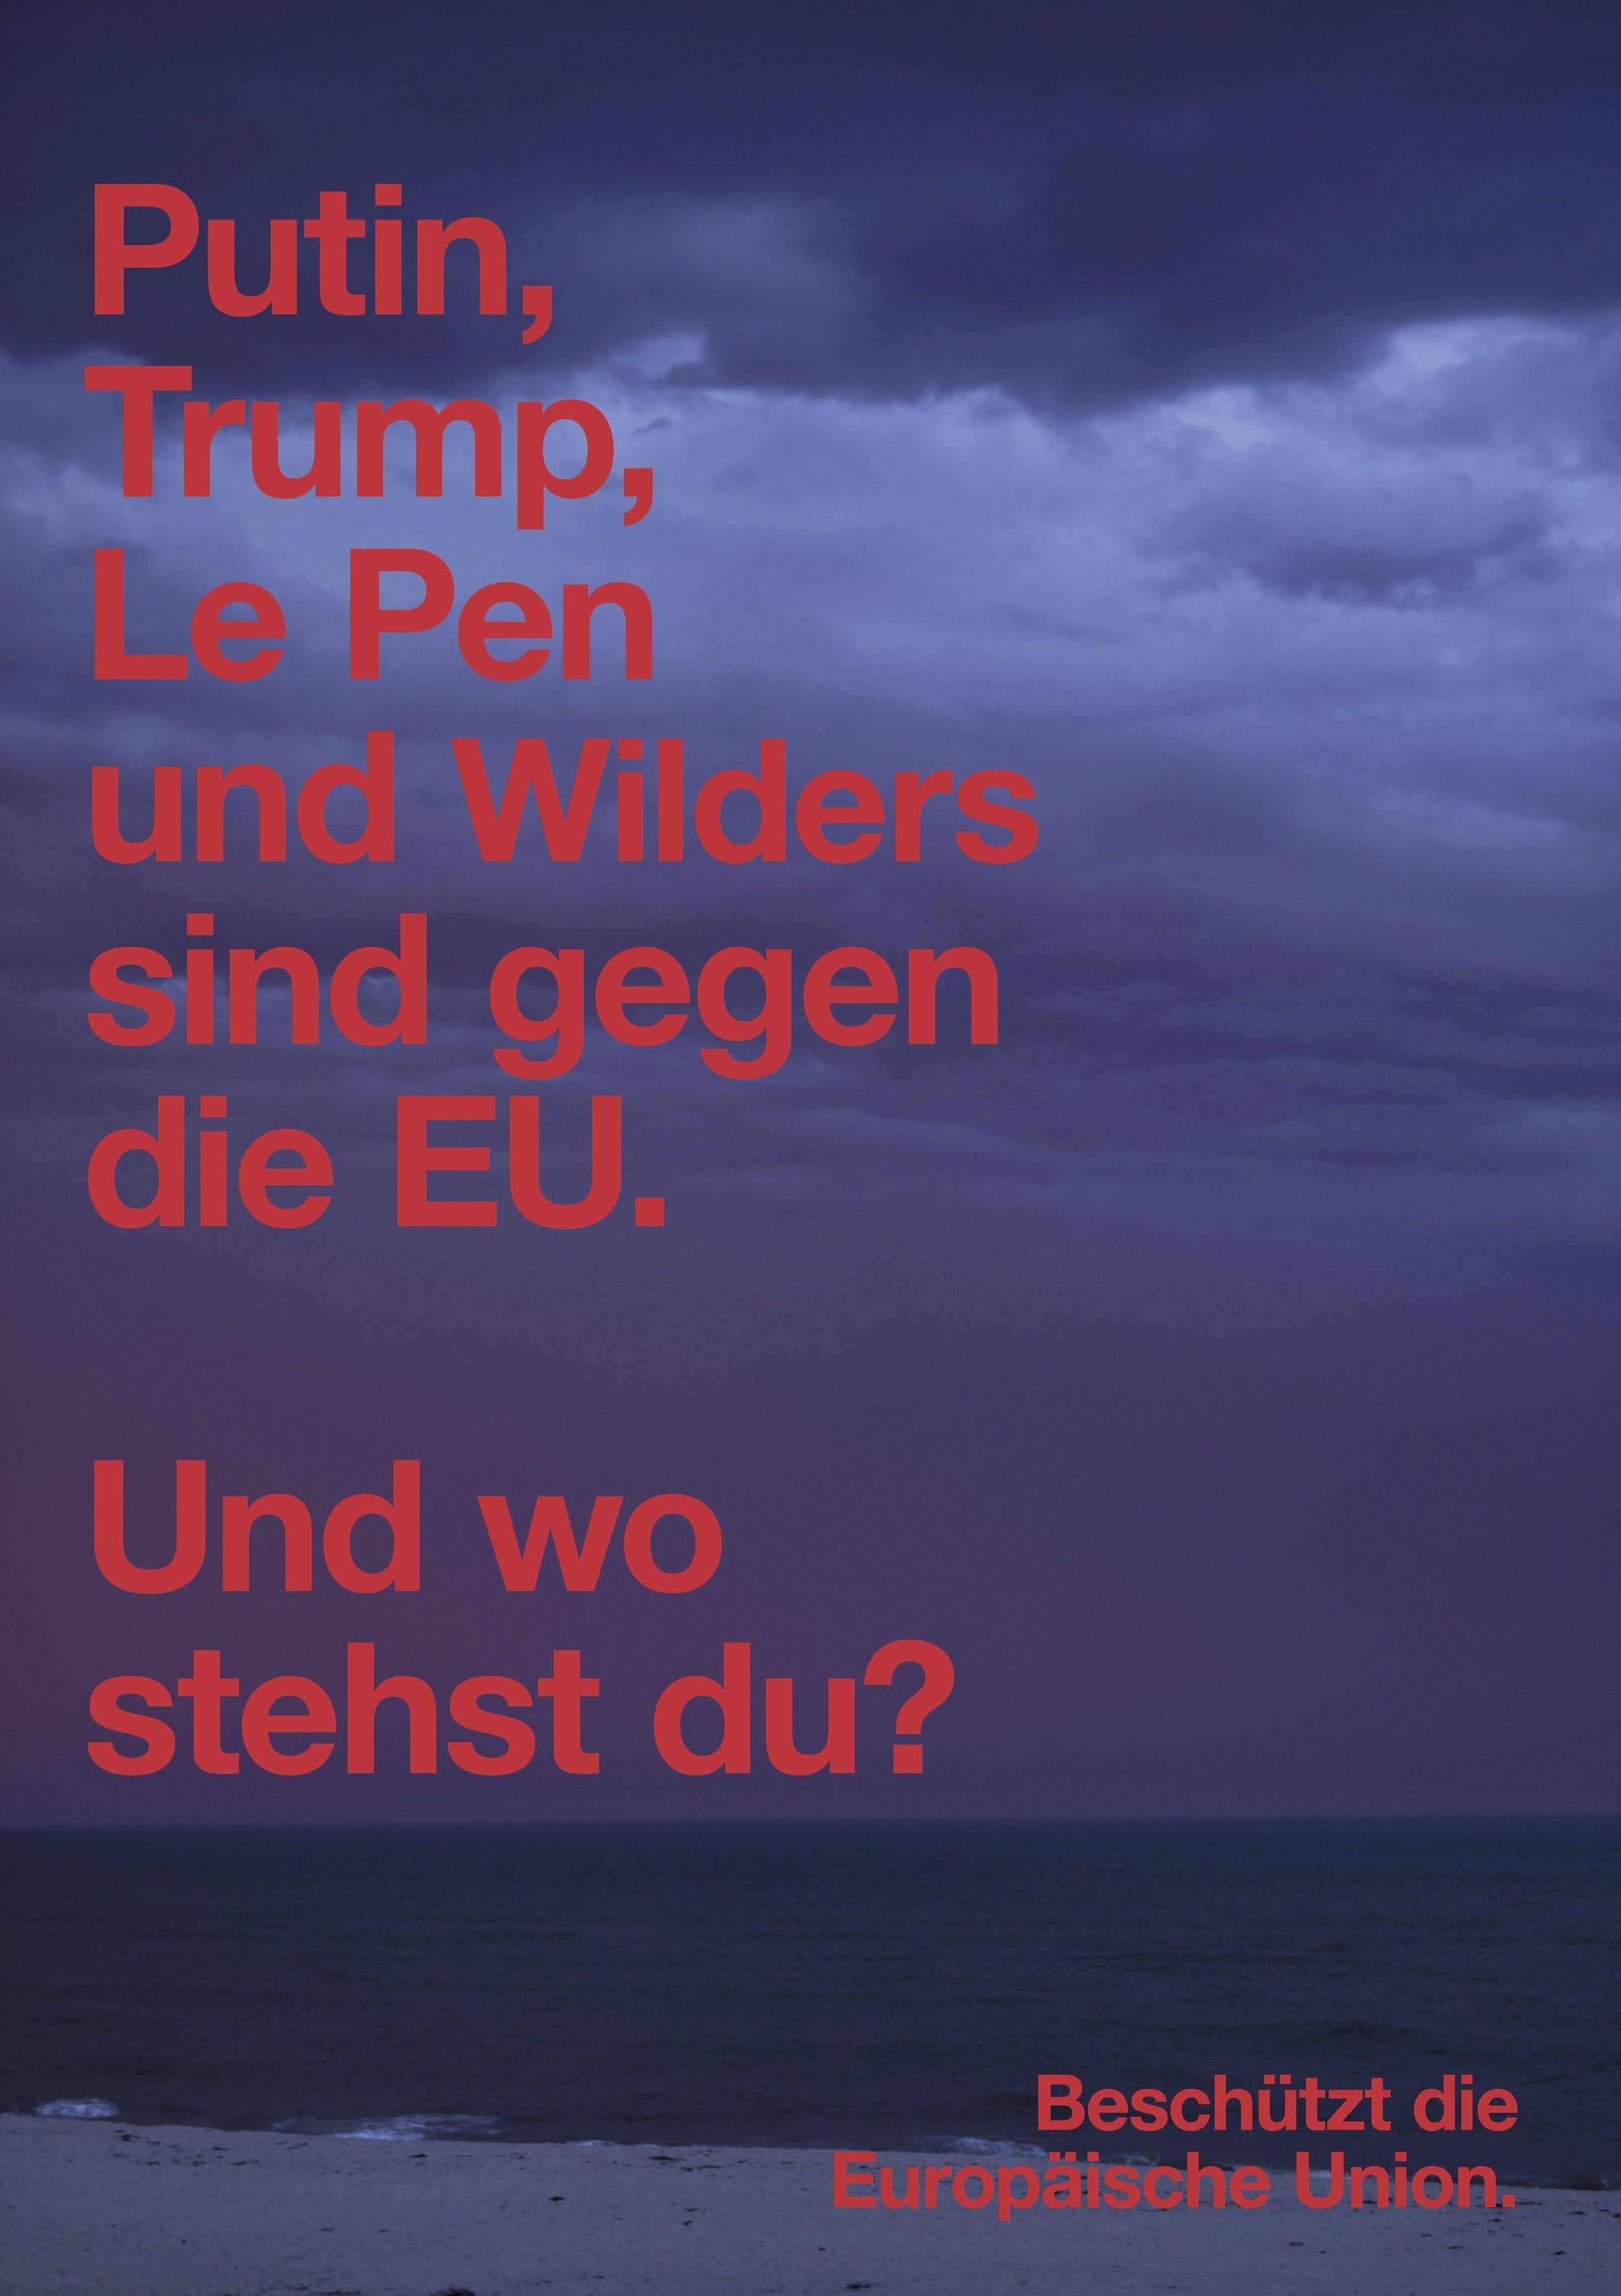 EU_GER-2017_HIGH-RES_A3.jpg